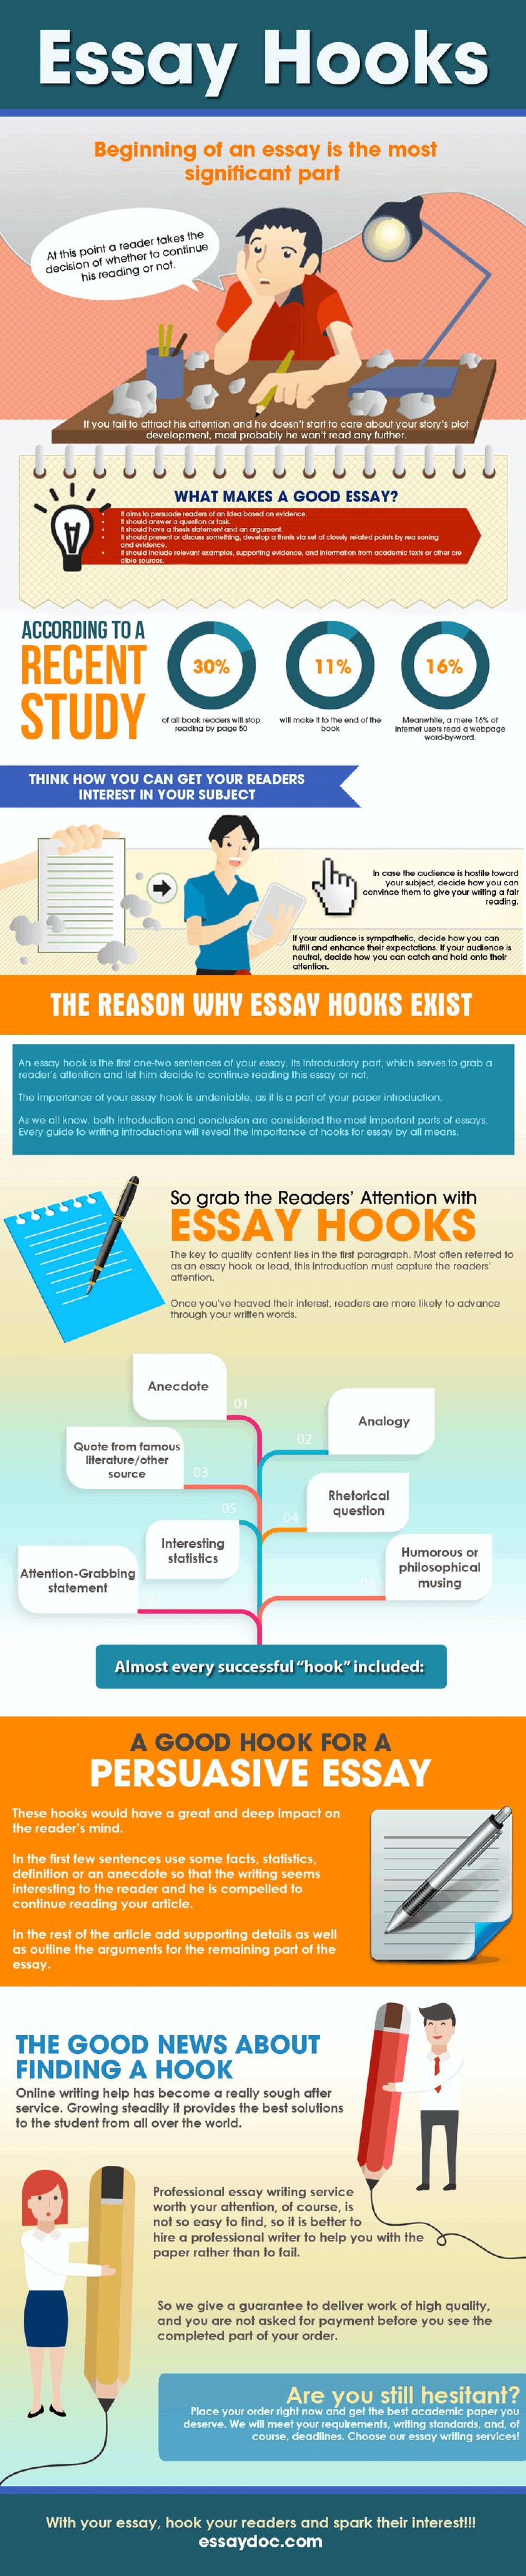 014 Examples Of Good Hooks For Persuasive Essays Argumentative Essay Hook Sentences Best List Incredible Pdf 1920